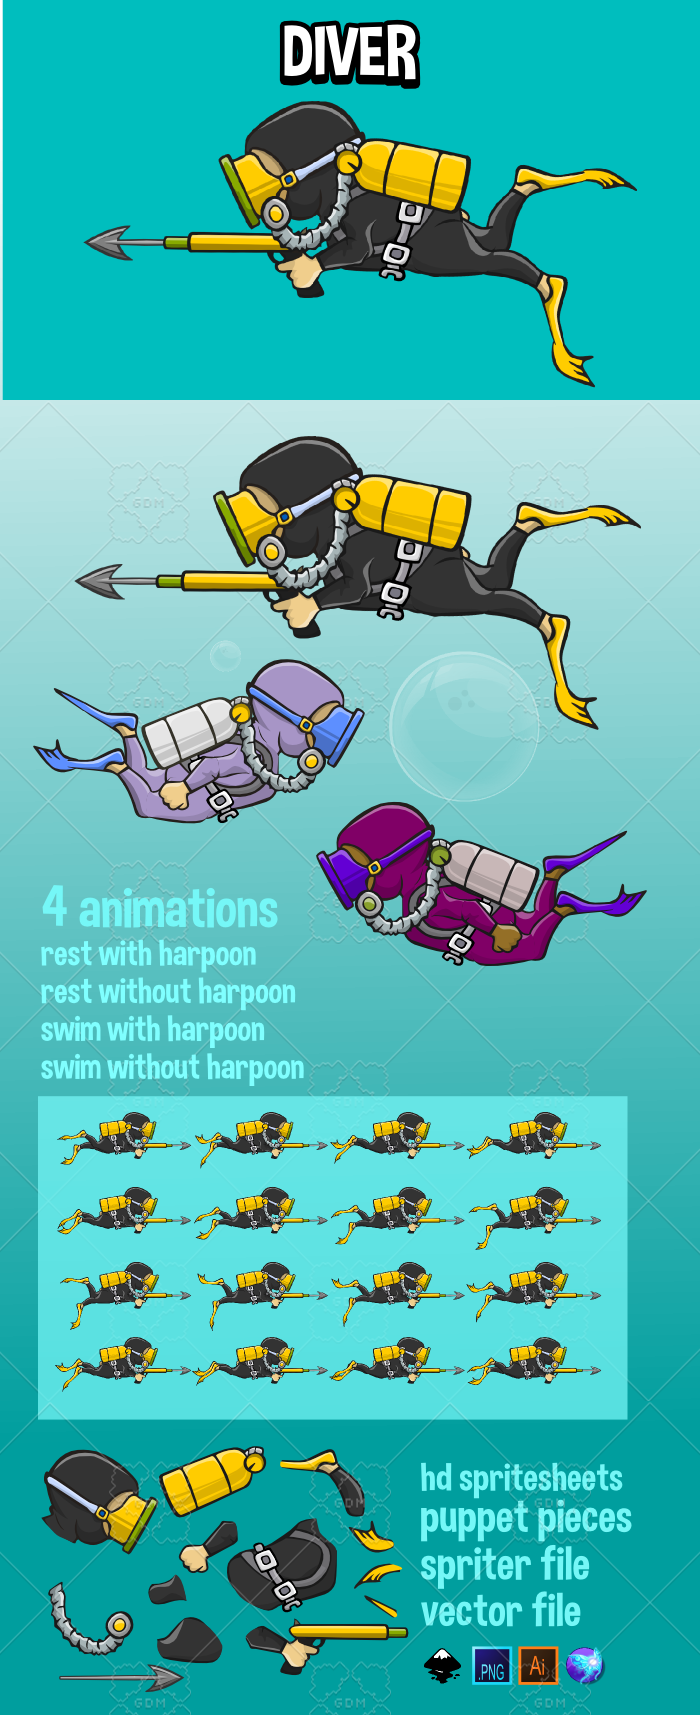 svg free download Underwater vector. Animated diver gamedev market